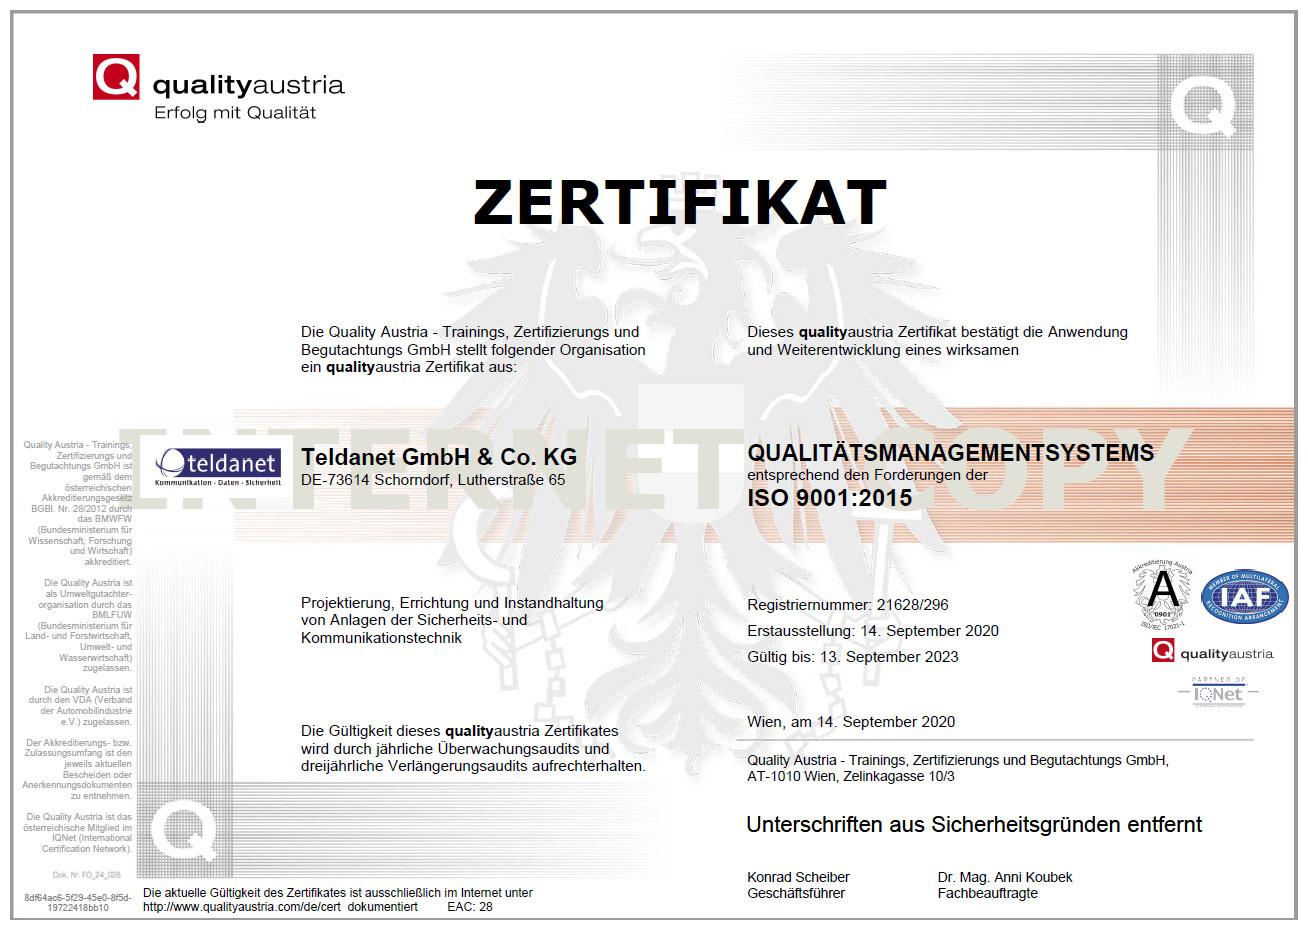 Teldanet GmbH: Unternehmen Zertifikat ISO 9001:2015